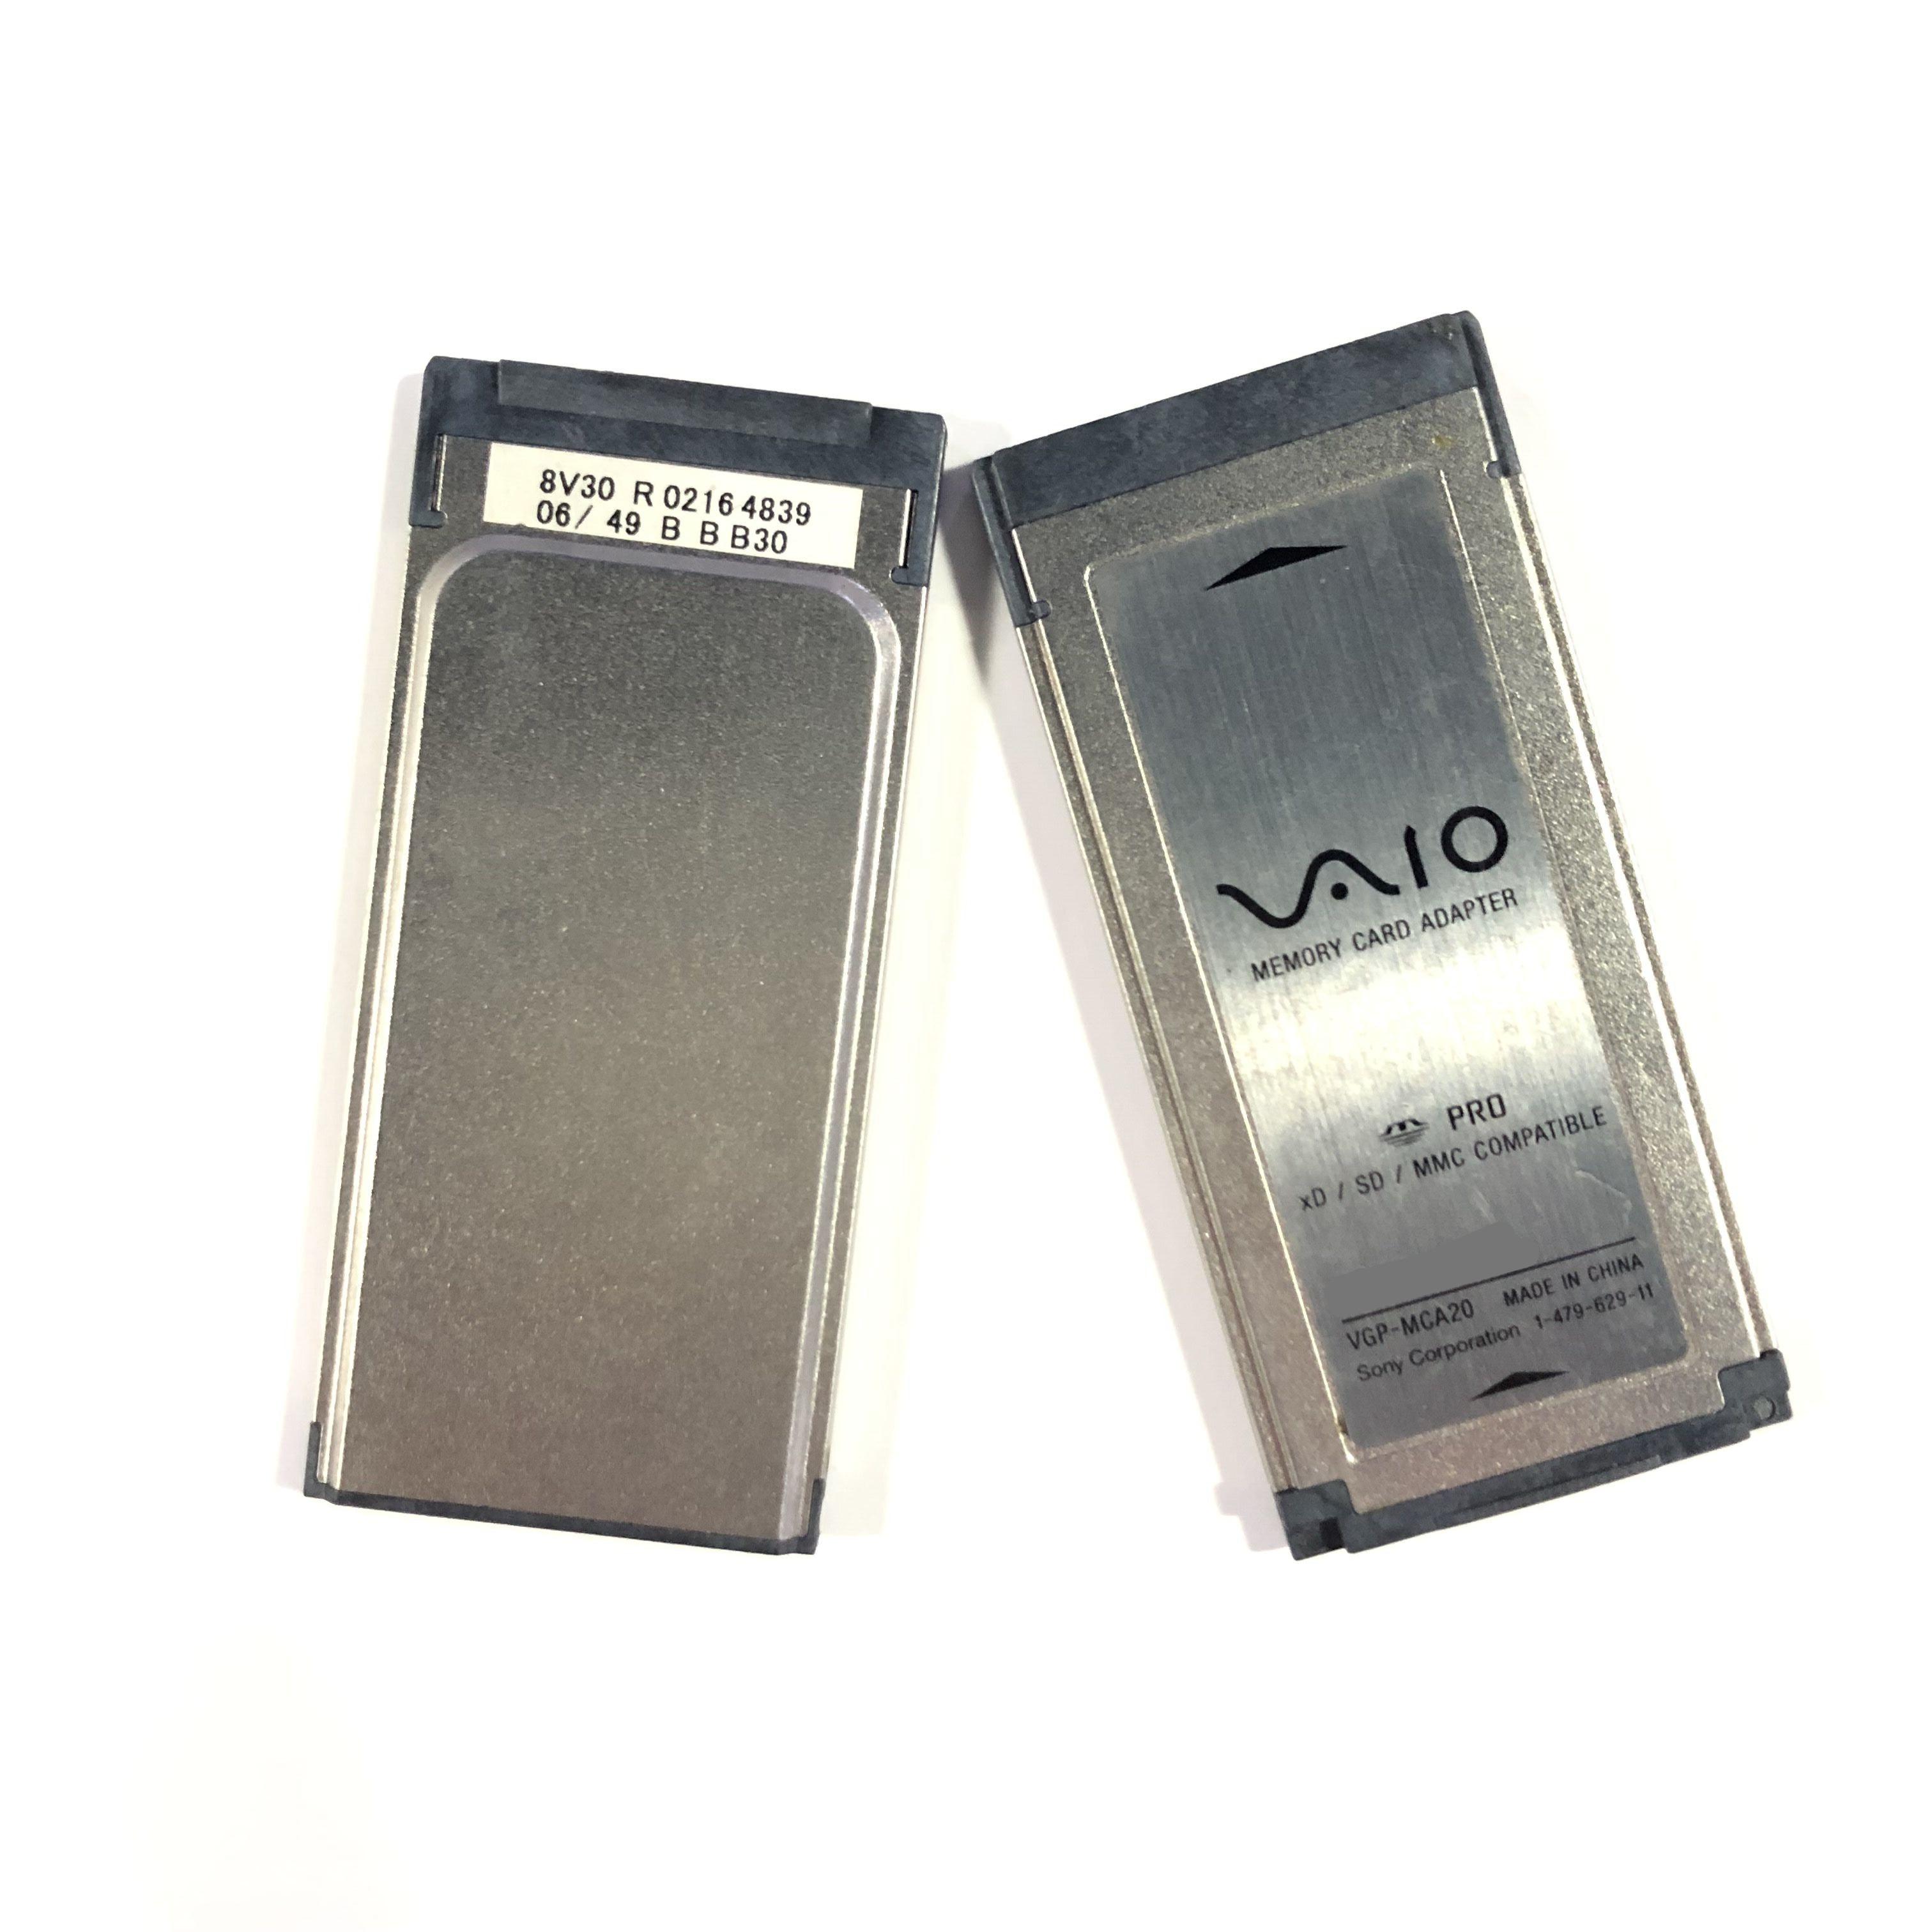 Original!!! SXS Card Adapter SD SDHC SDXC Card Into Express Card SXS Card Adaptor For SD SDHC SDXC Card